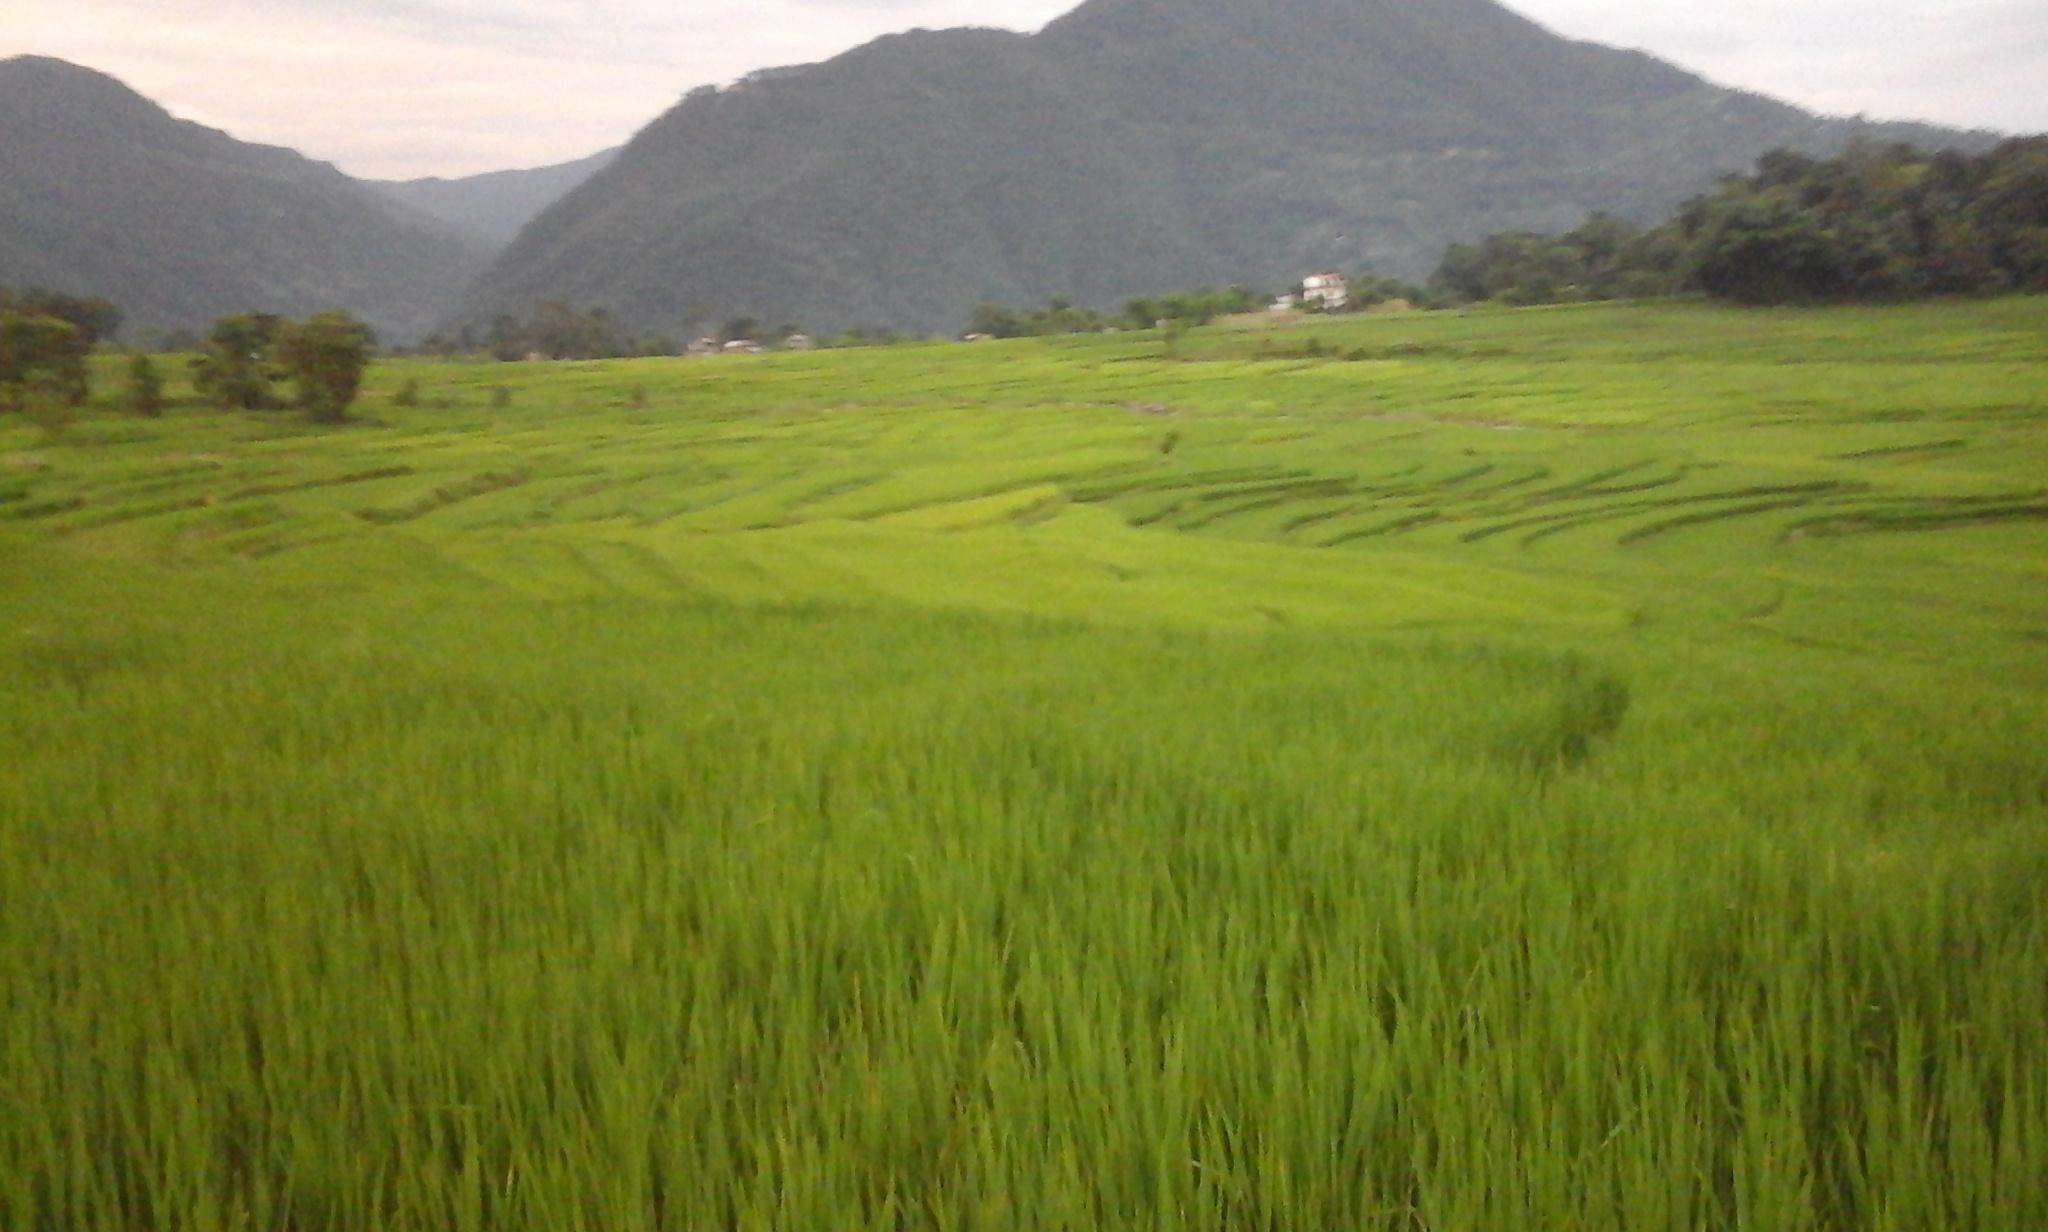 IYJ | Rice-cum-fish farming: opportunities in Nepal - Samita